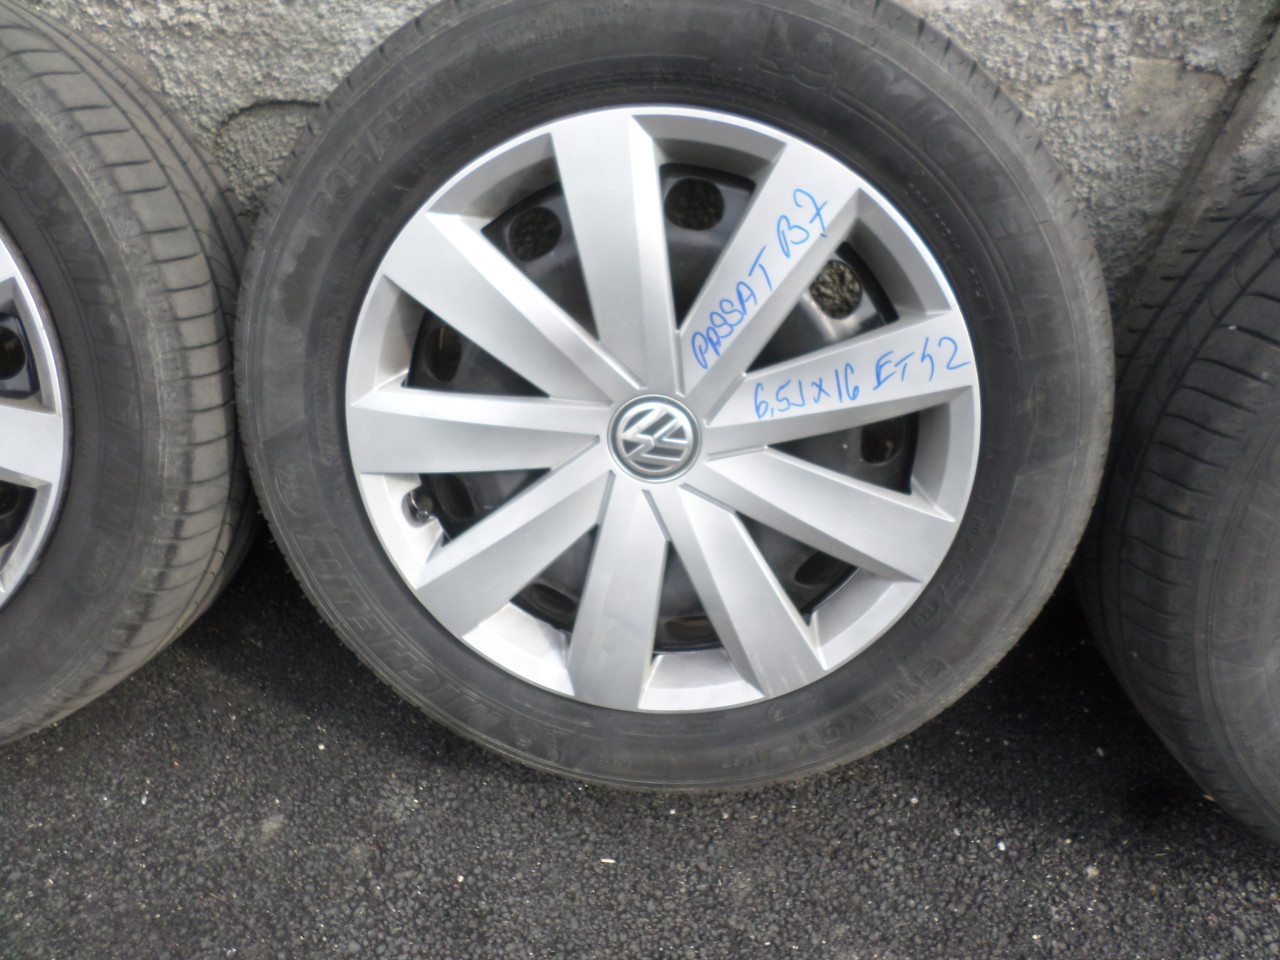 Jante Tabla 16 VW Passat Golf 5 Golf 6 Vara 205 55 16 Michelin dot (0618)